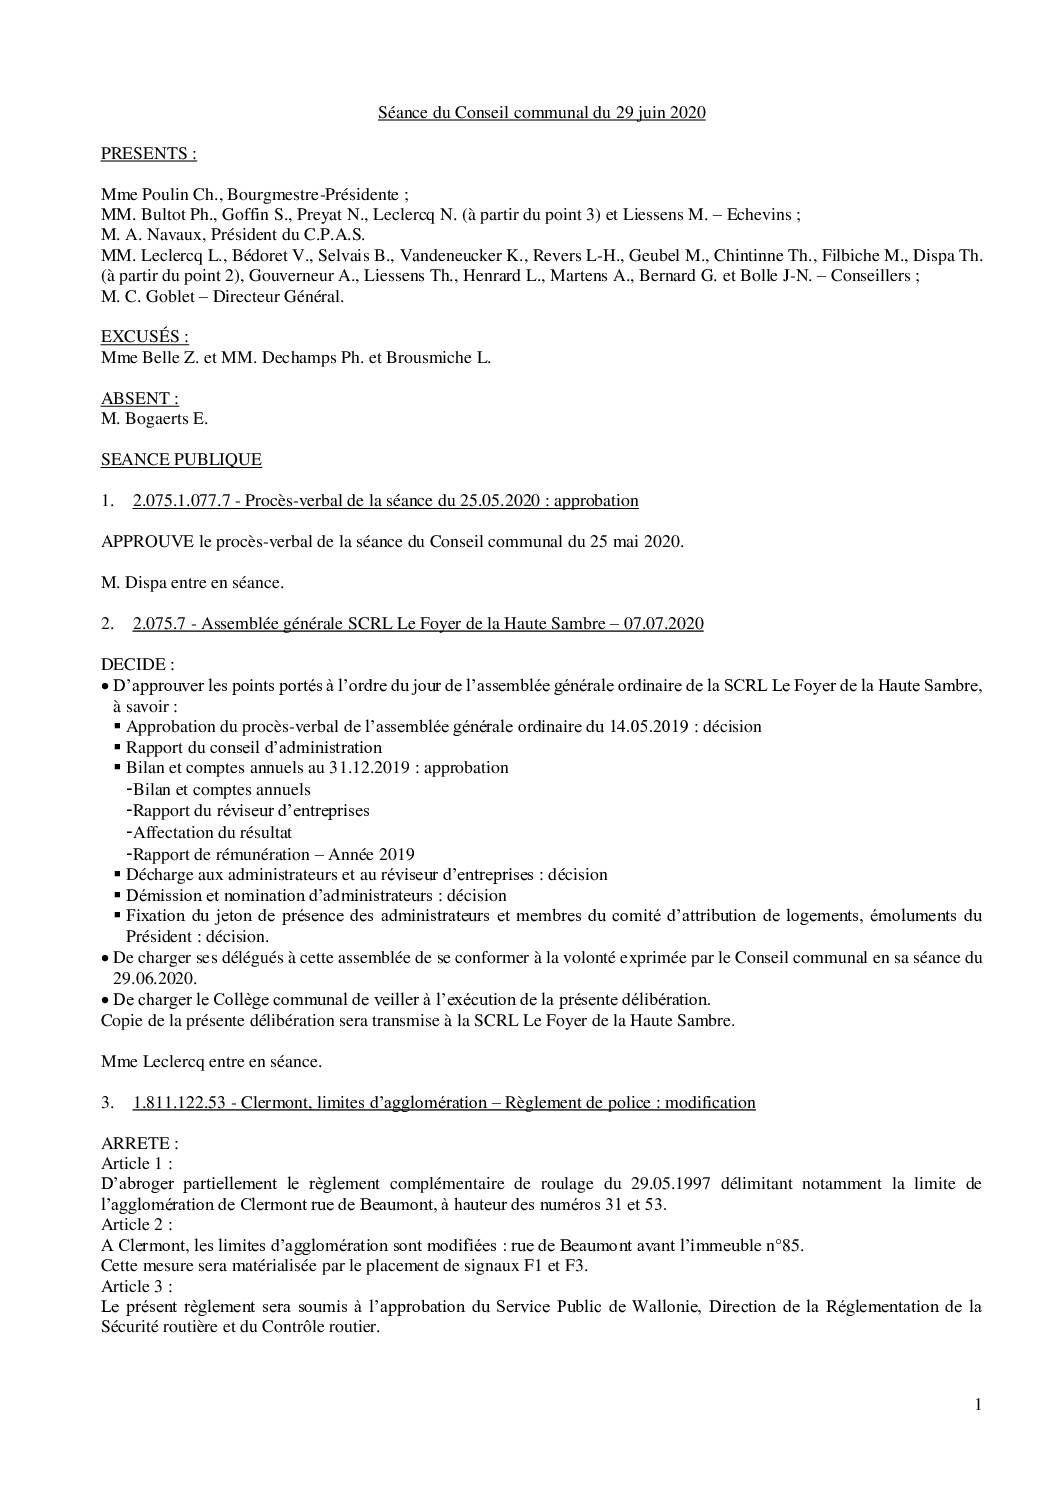 Conseil communal – 29 juin 2020